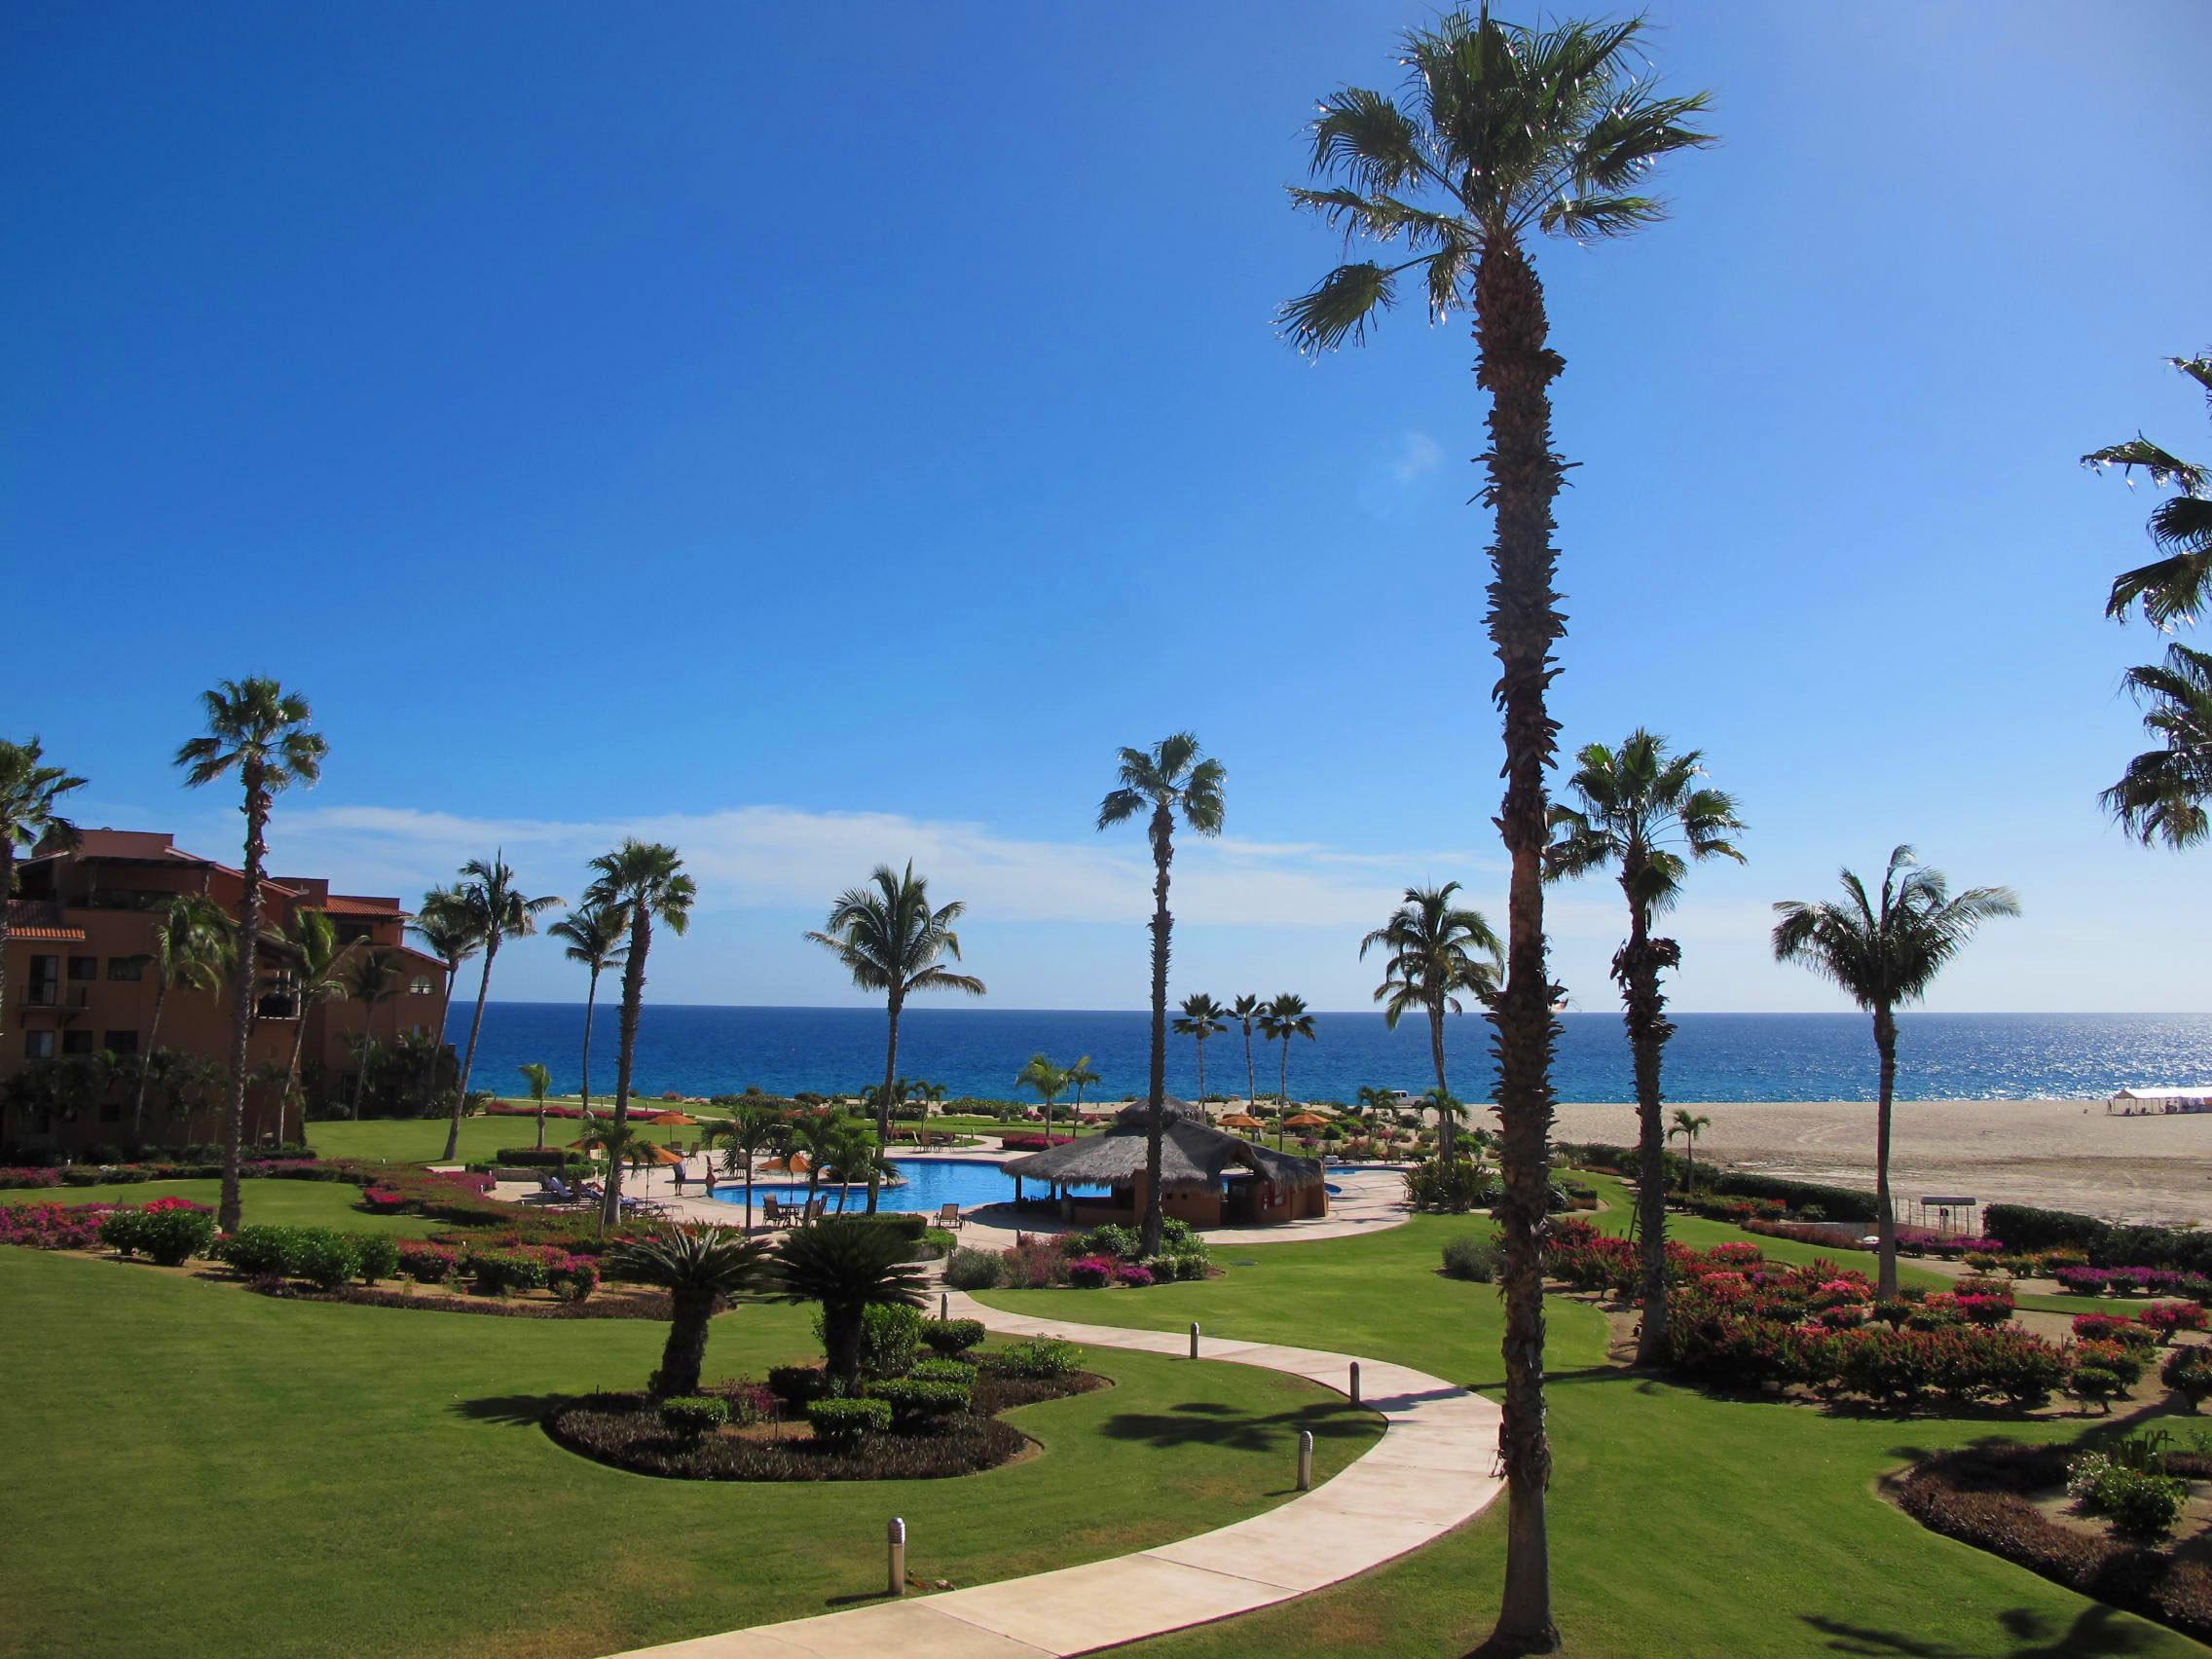 Condominium for Sale at Casa Heather Dorado 206 Other Baja California Sur, Baja California Sur 23406 Mexico